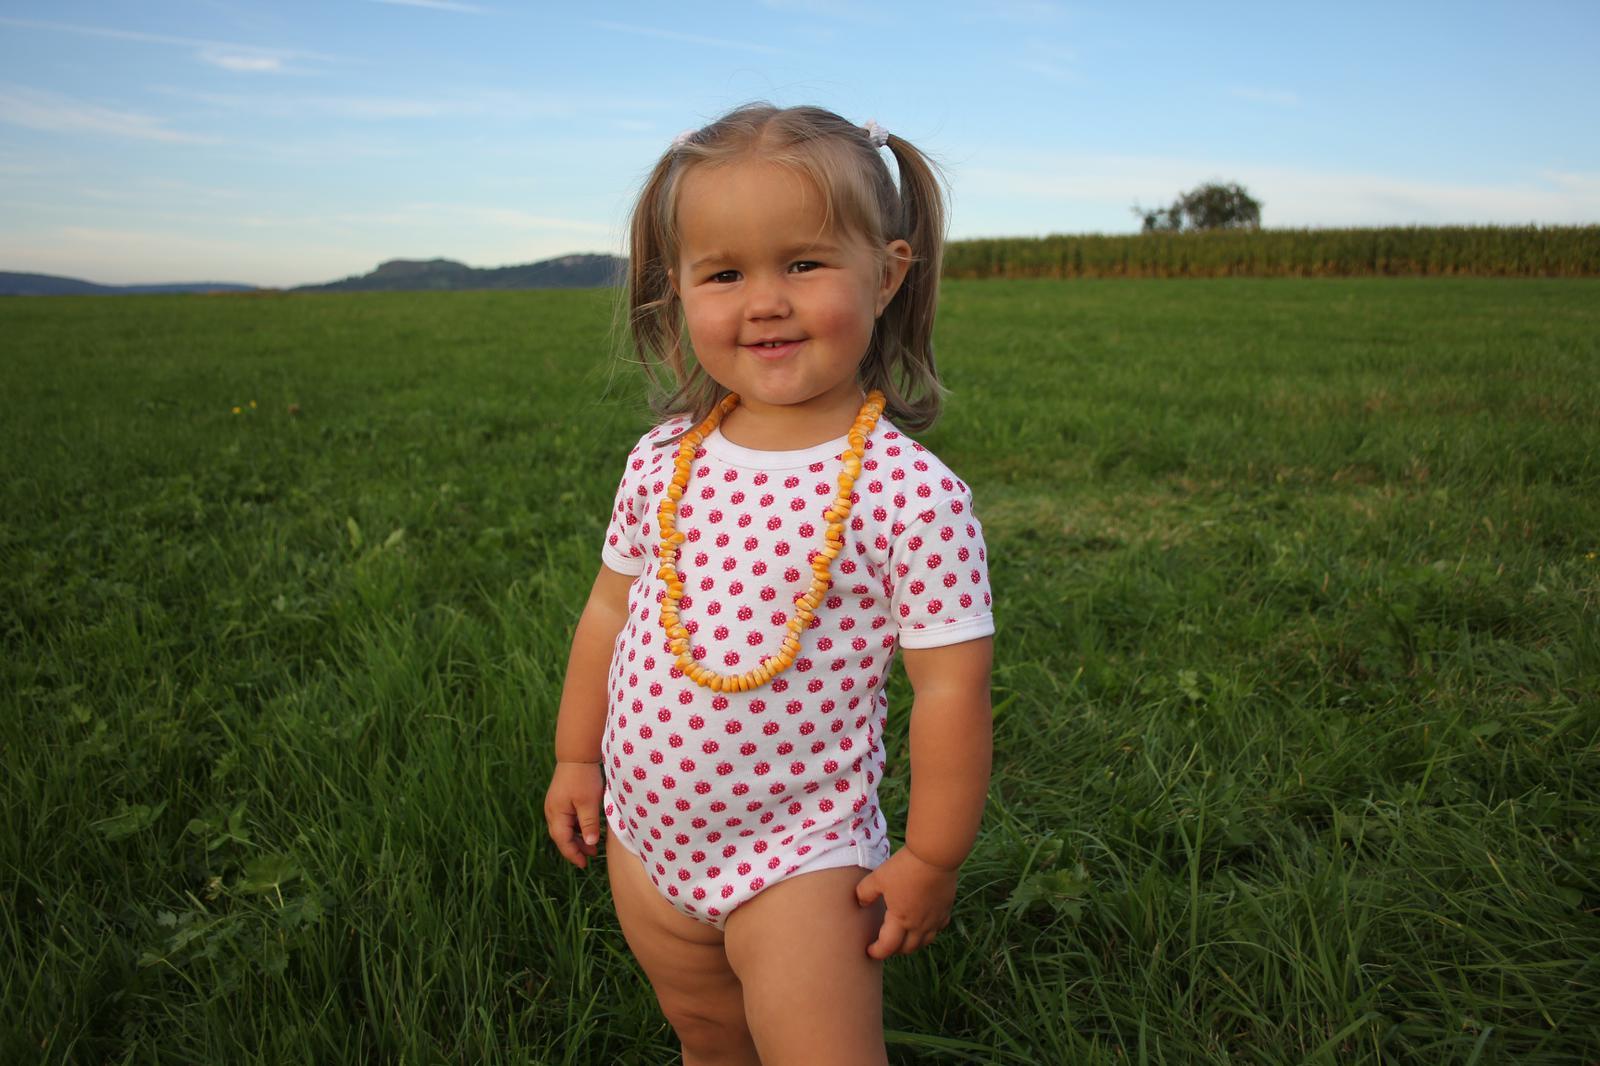 Maisketten fädeln|Maisketten|Naturmaterialien|Maisperlen|Spätsommer|Herbst|DIY|Basteln mit Kindern|Maiskolben|Glückswerkstatt